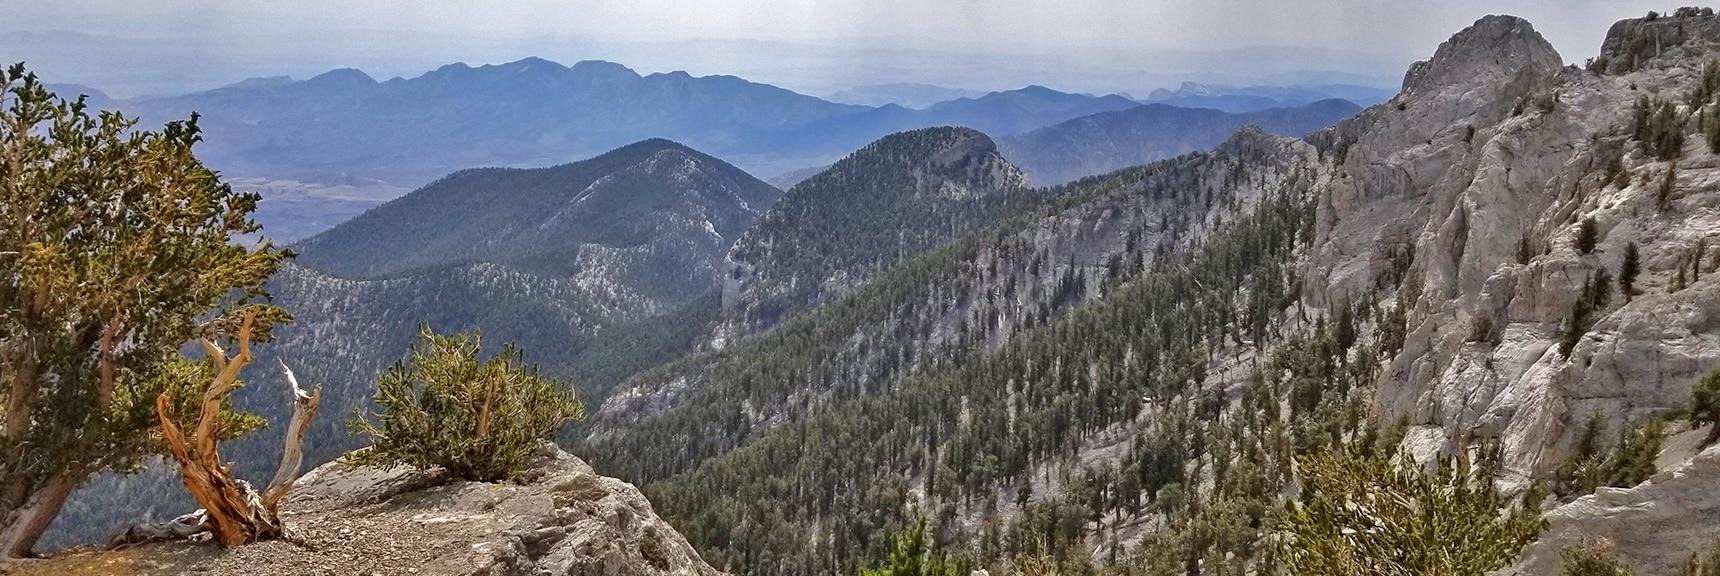 View of La Madre Mt., Fletcher Peak, Mummy Mt. Toe and Eastern Cliffs   Mummy Mountain Northern Rim Overlook, Spring Mountain Wilderness, Nevada